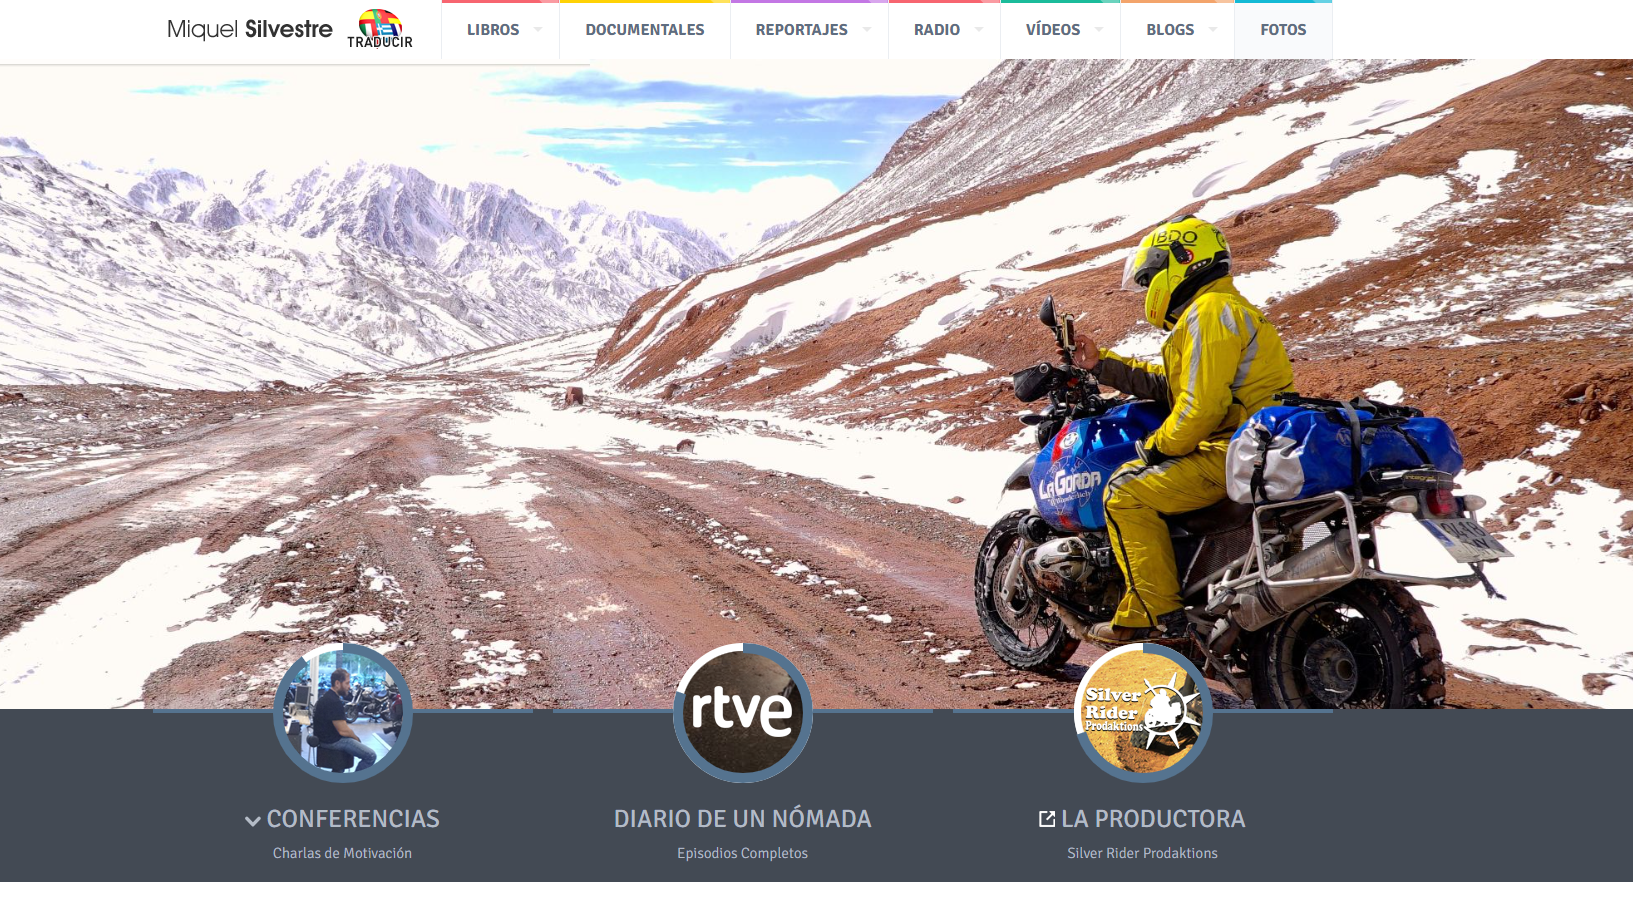 Viajes de Miquel Silvestre | Entrevista en entrevisttas.com